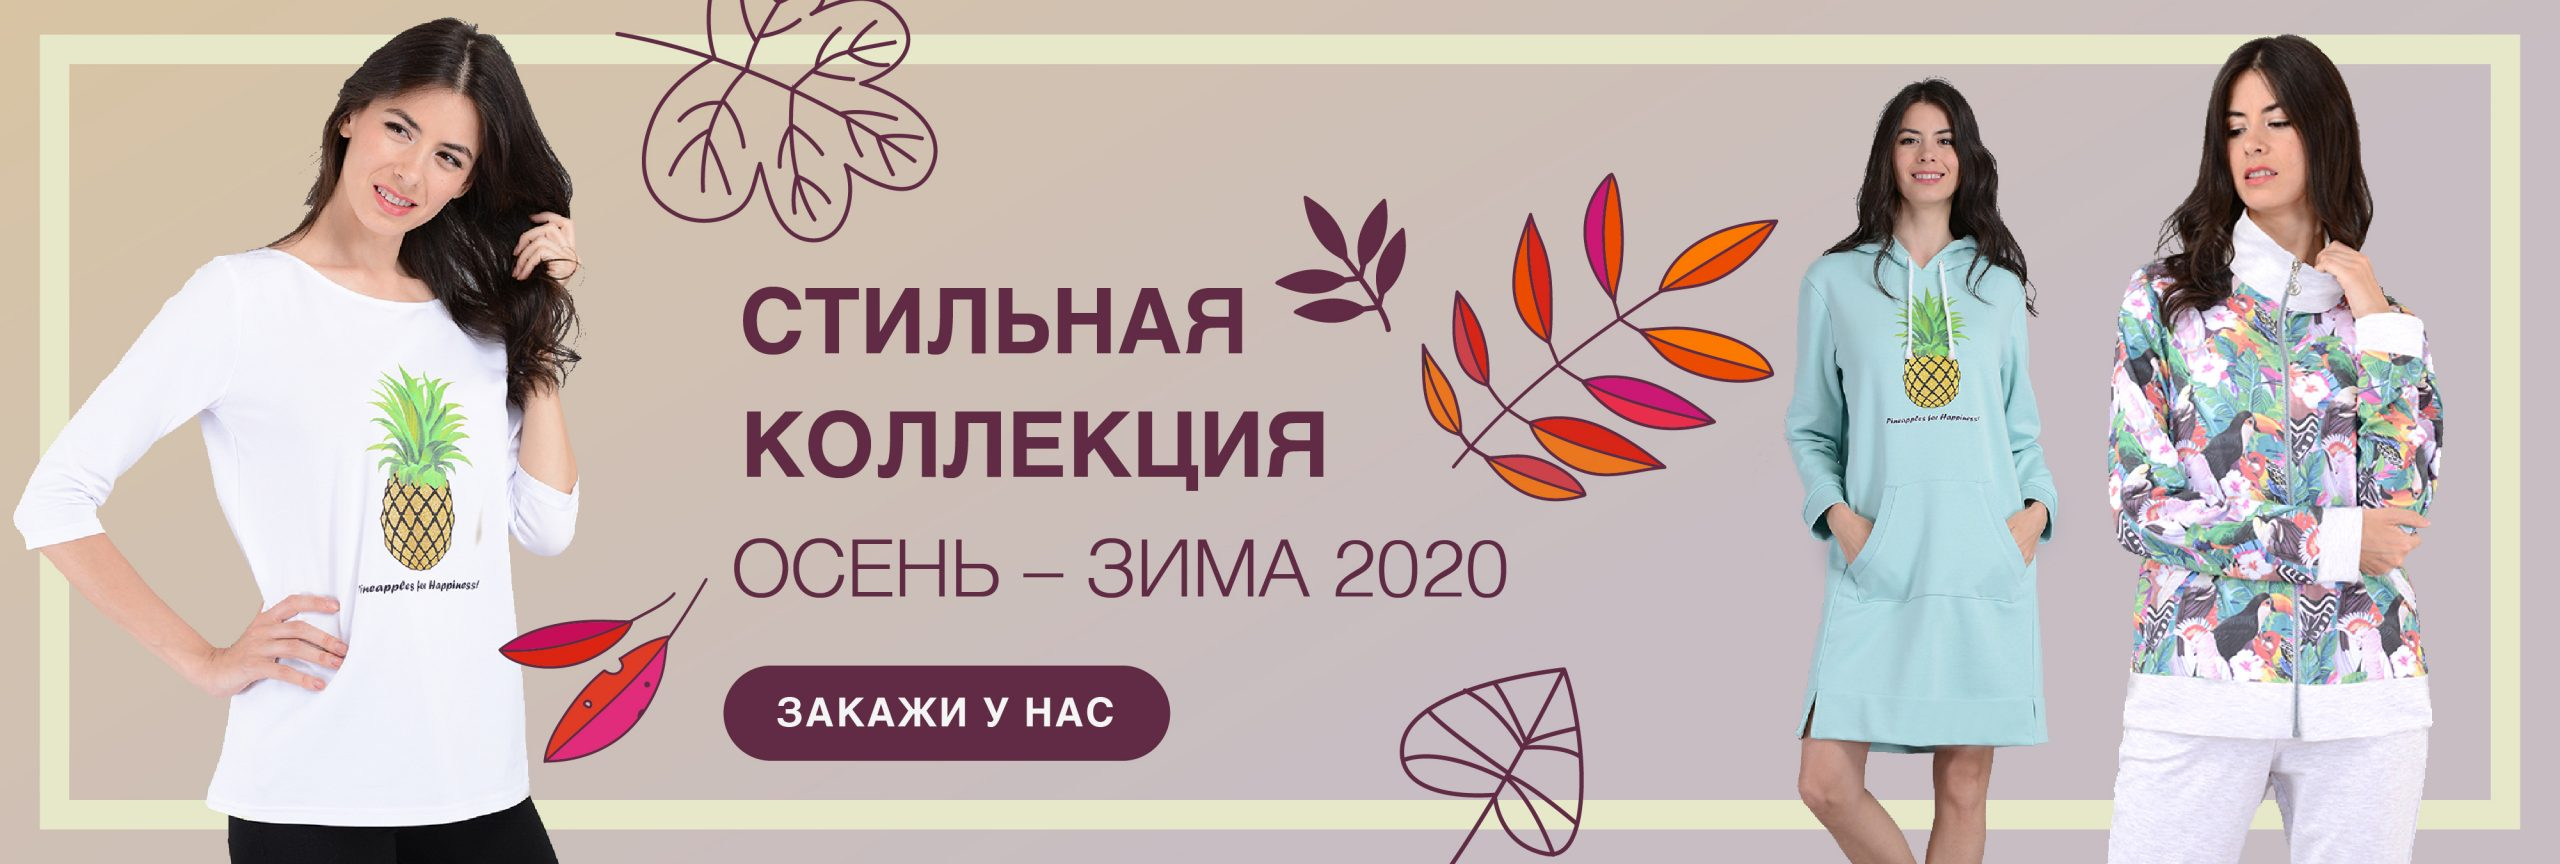 MakiMagma баннер на главную осень 2020